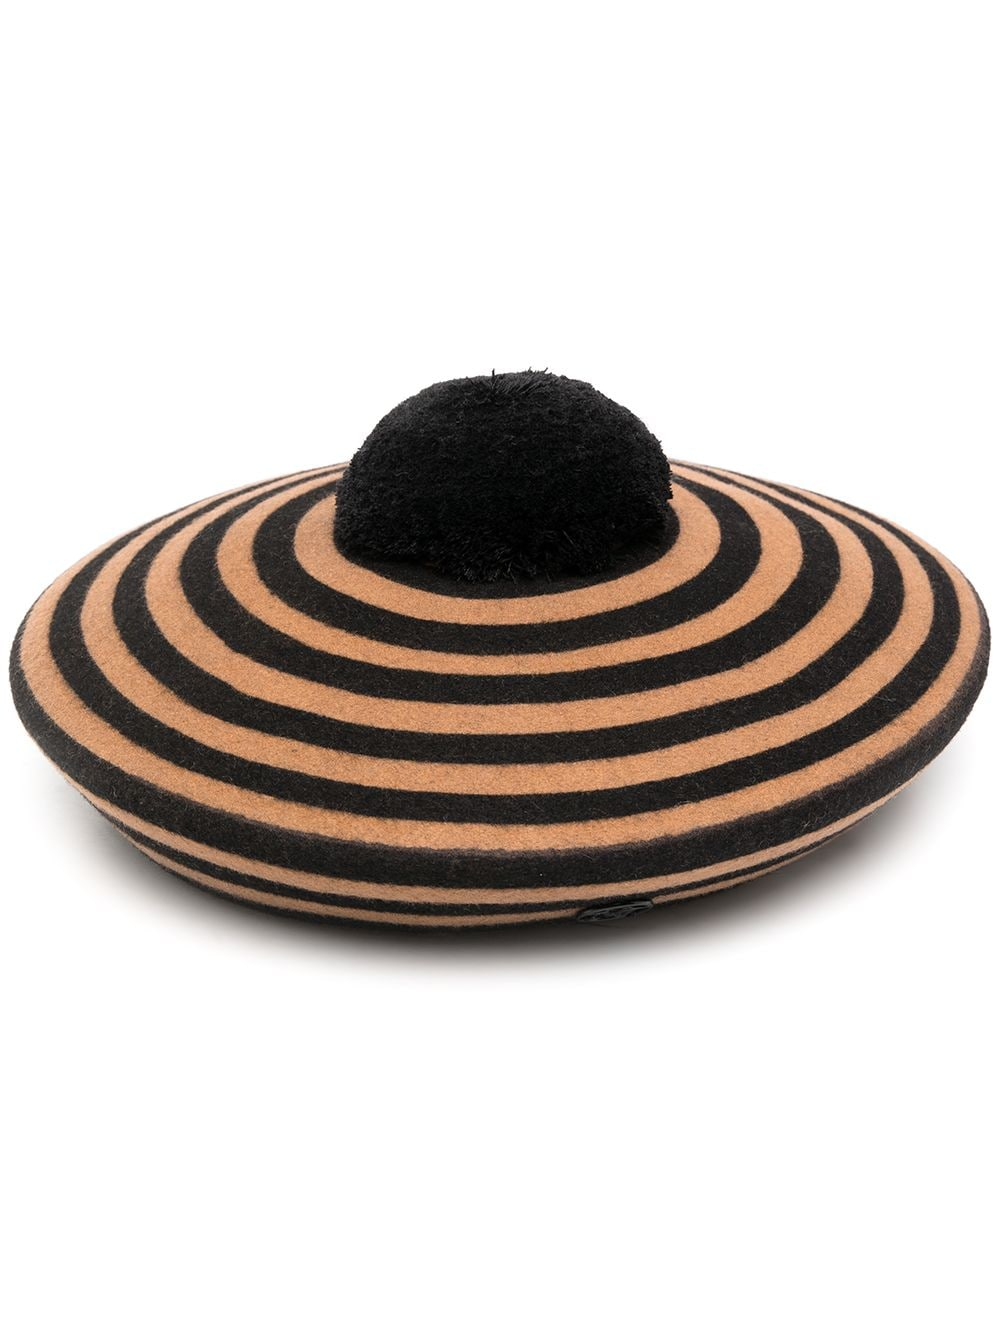 IDAHO HAT 20PF STRIPEY FELT